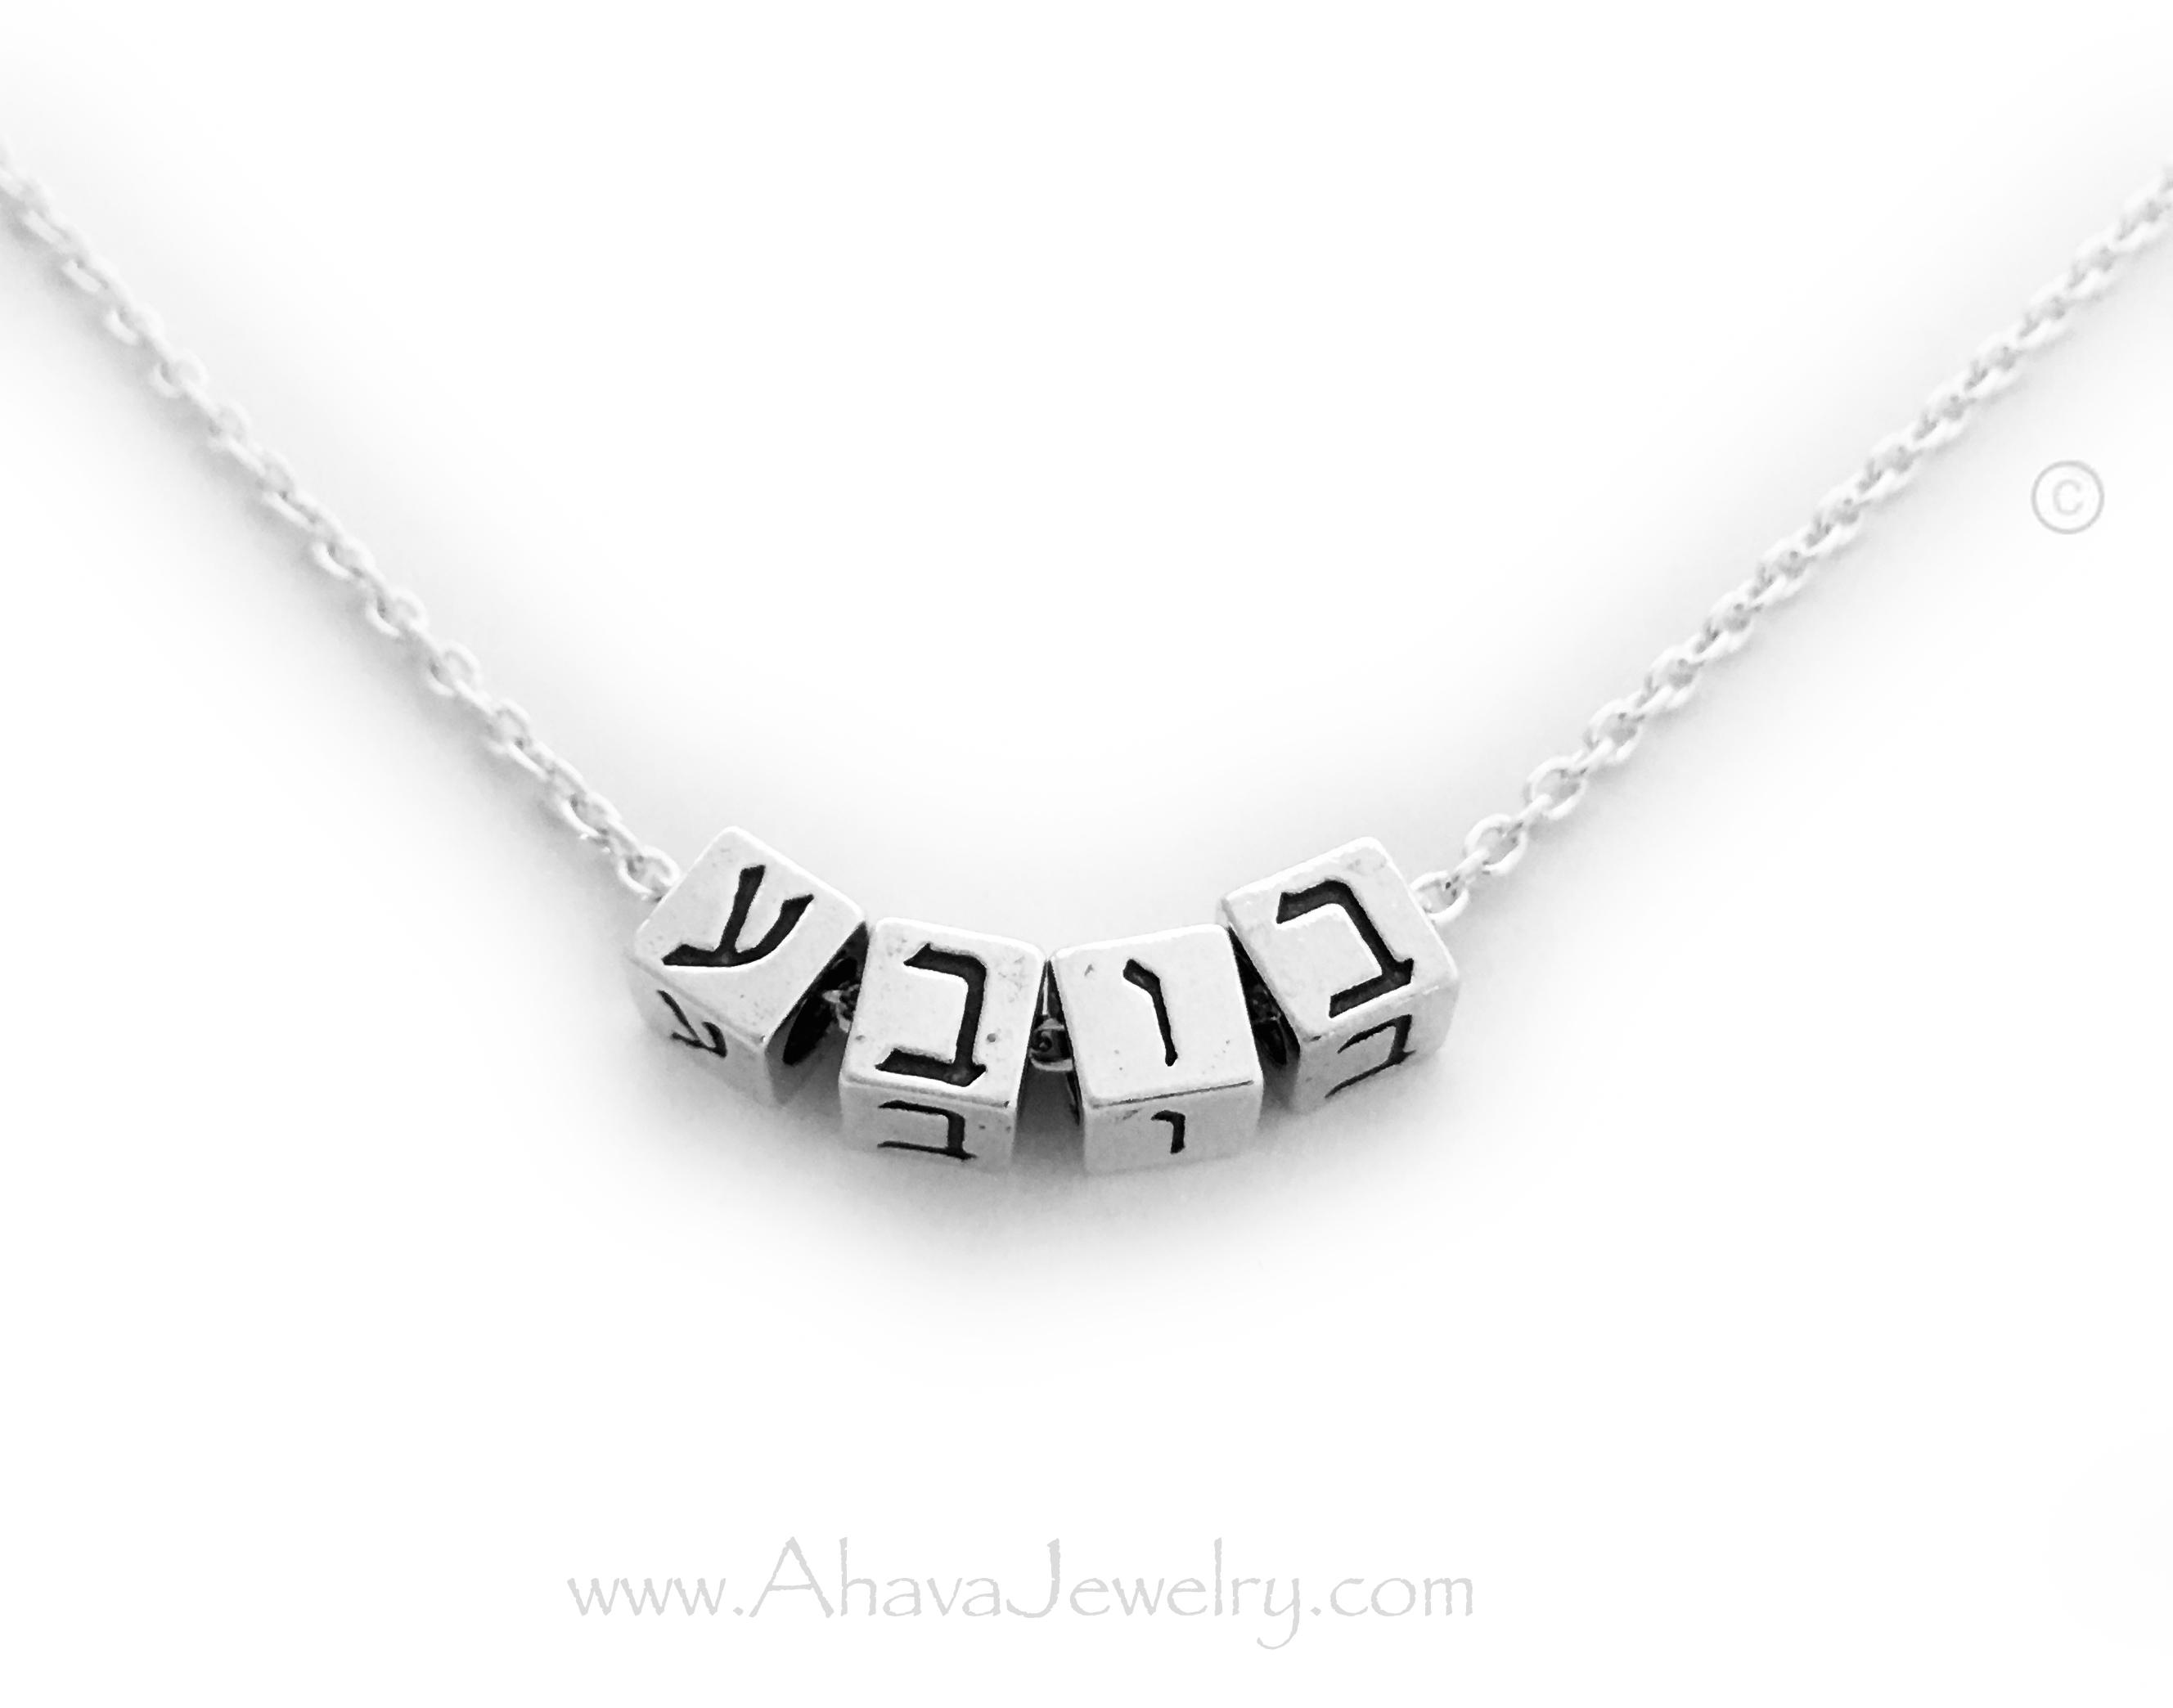 Ahava Jewelry